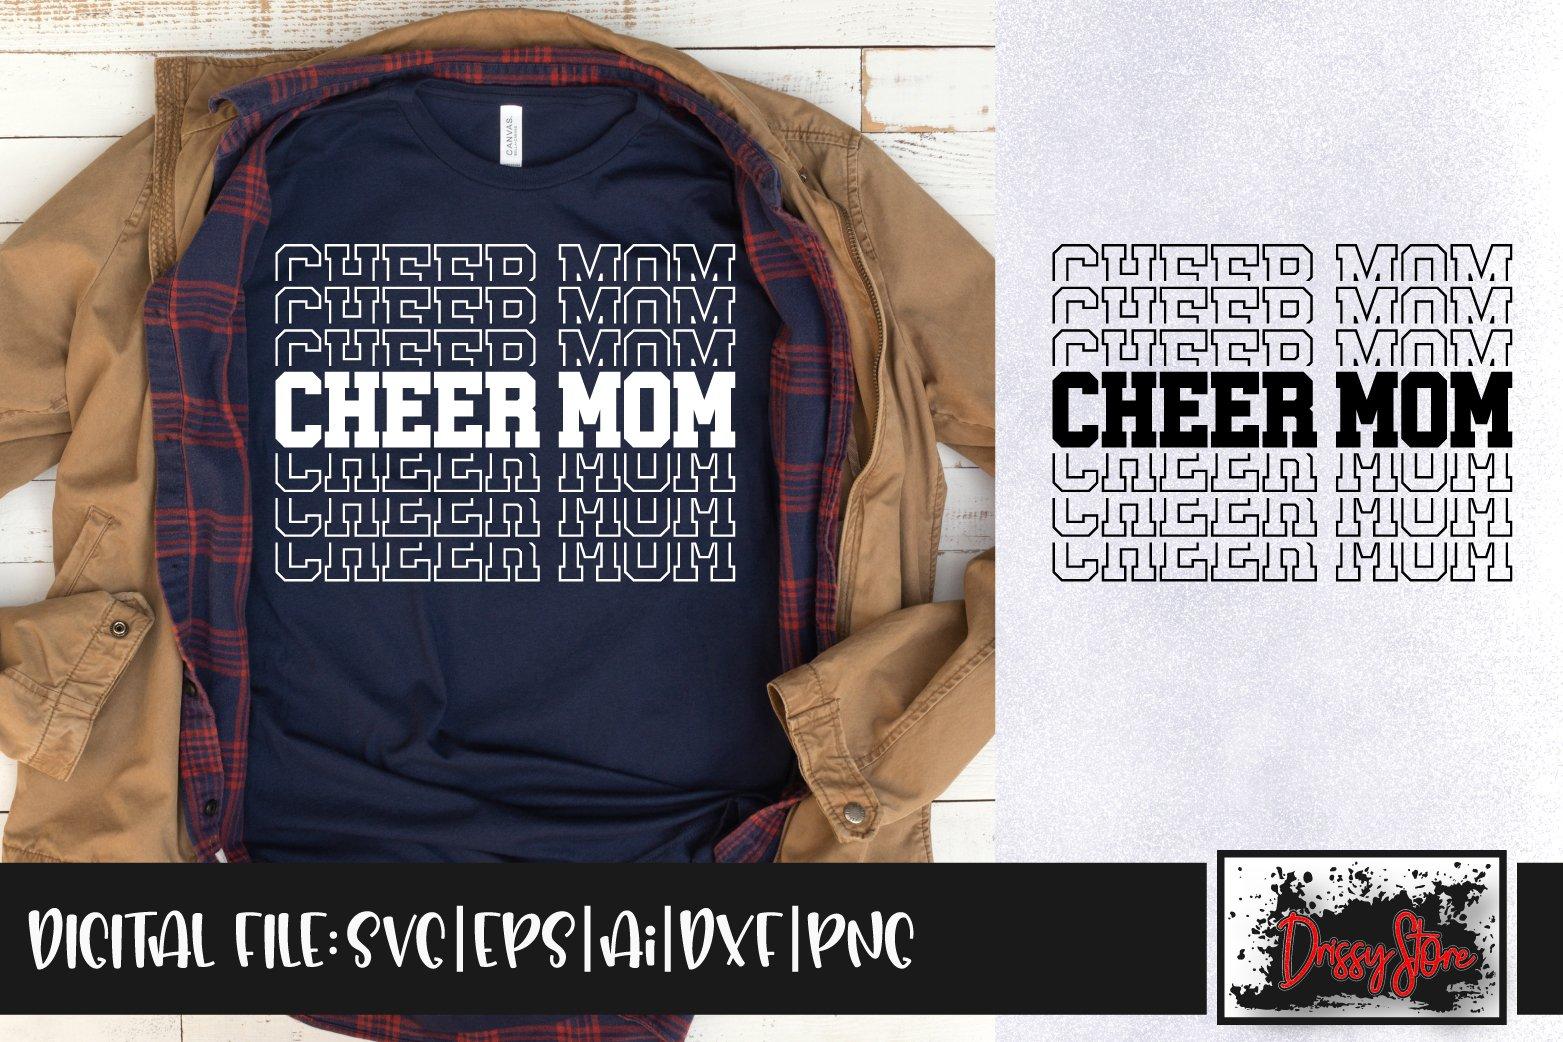 Cheer Mom Svg Dxf Ai Eps Png 920975 Cut Files Design Bundles